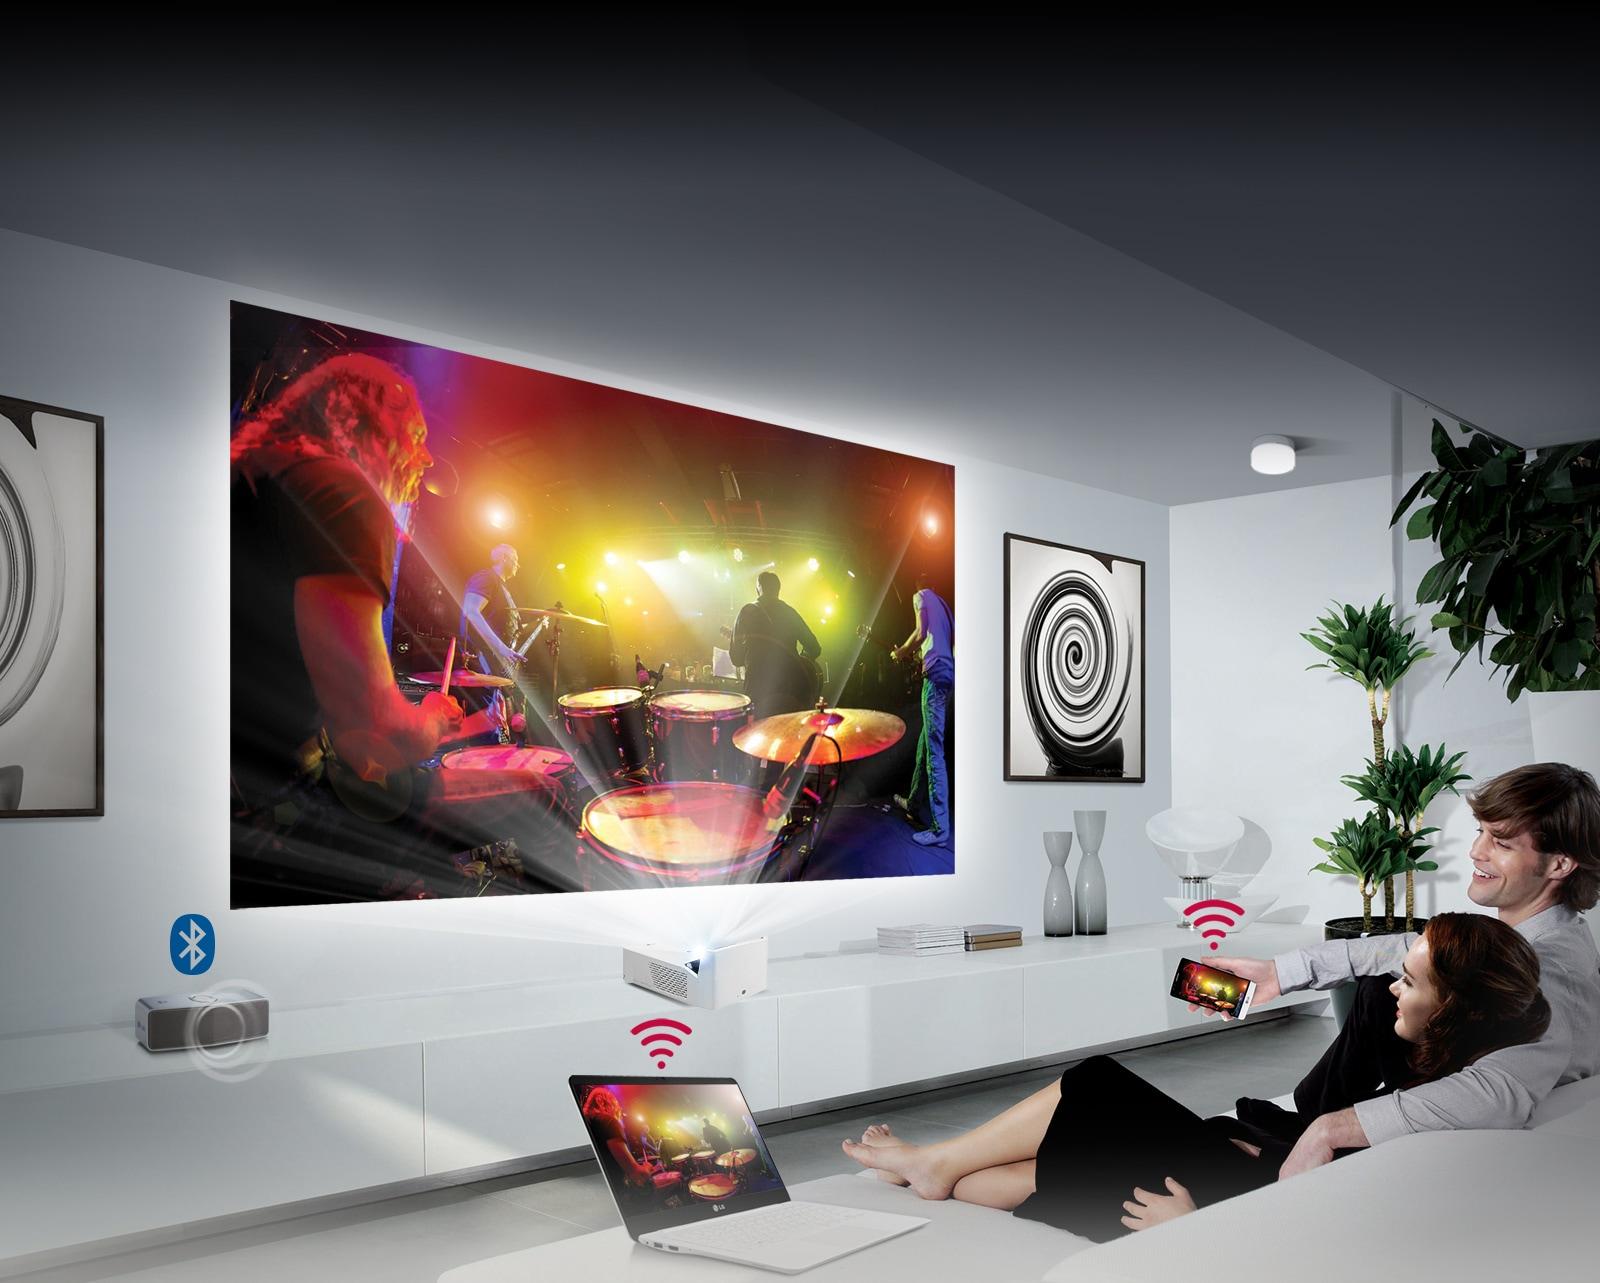 PJT-HF65L-09-1-Wireless-Screen-Share-Desktop